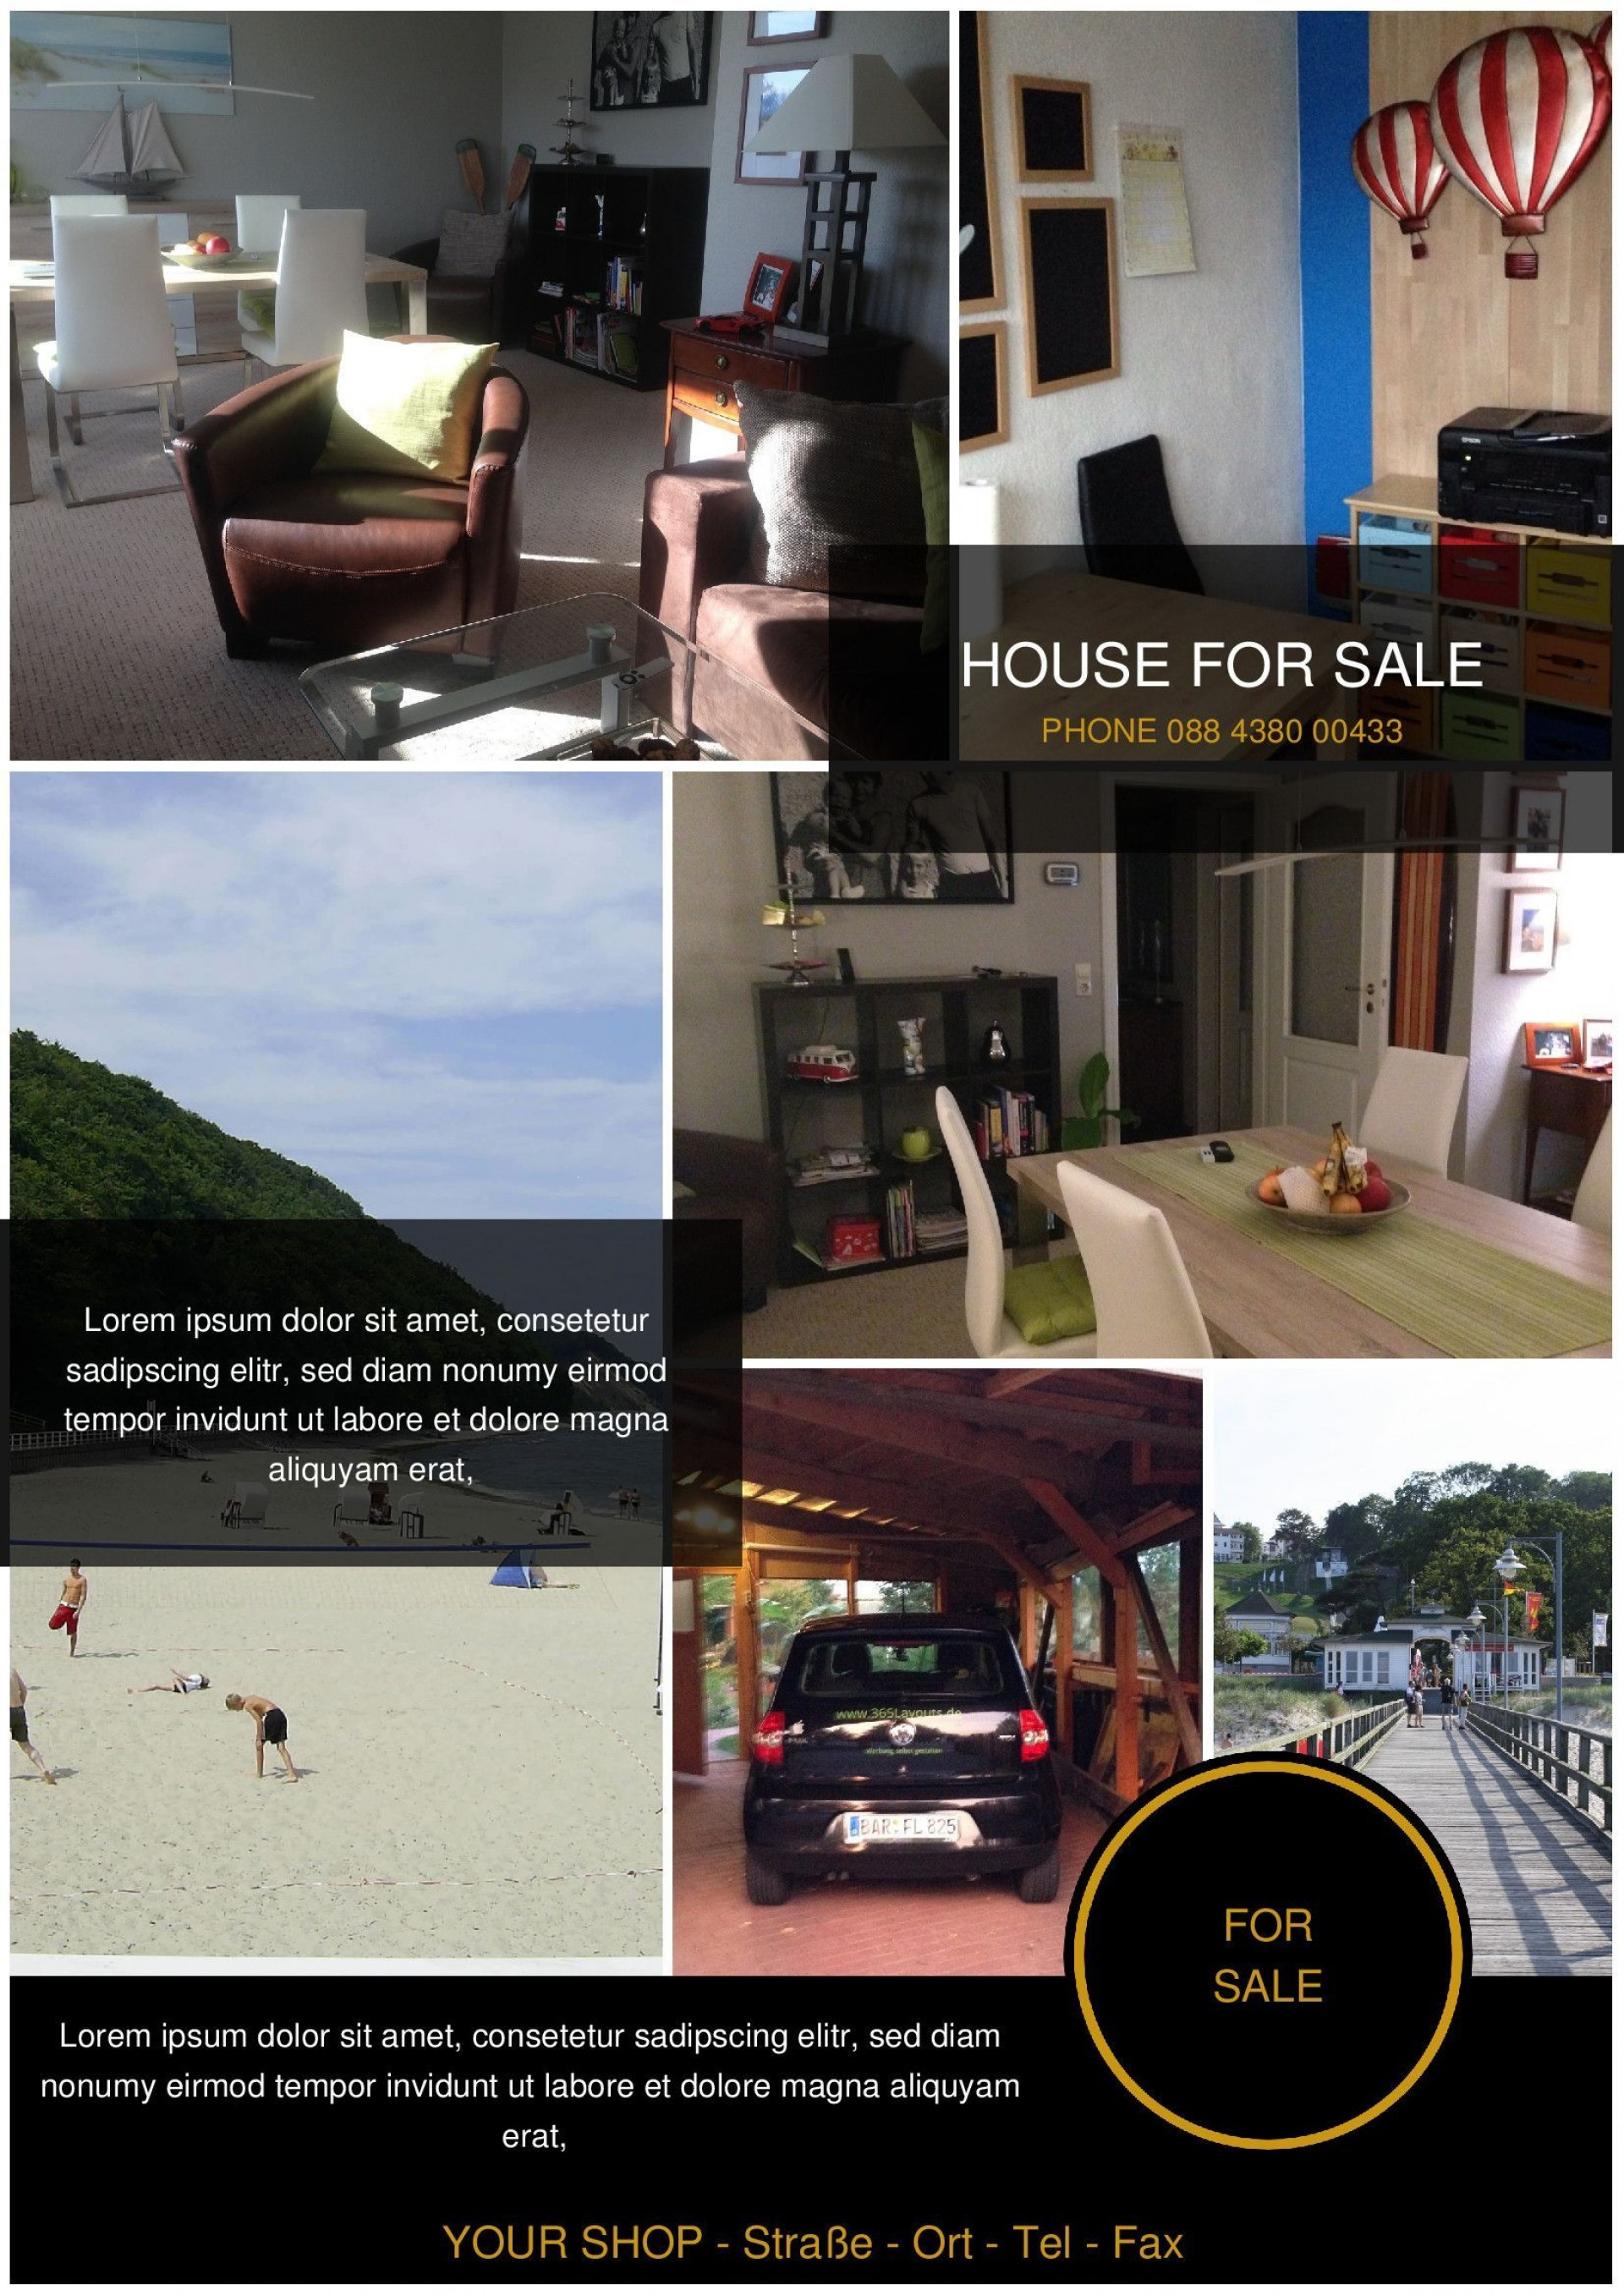 003 Singular Open House Flyer Template Free High Def  Holiday Preschool School Microsoft1920